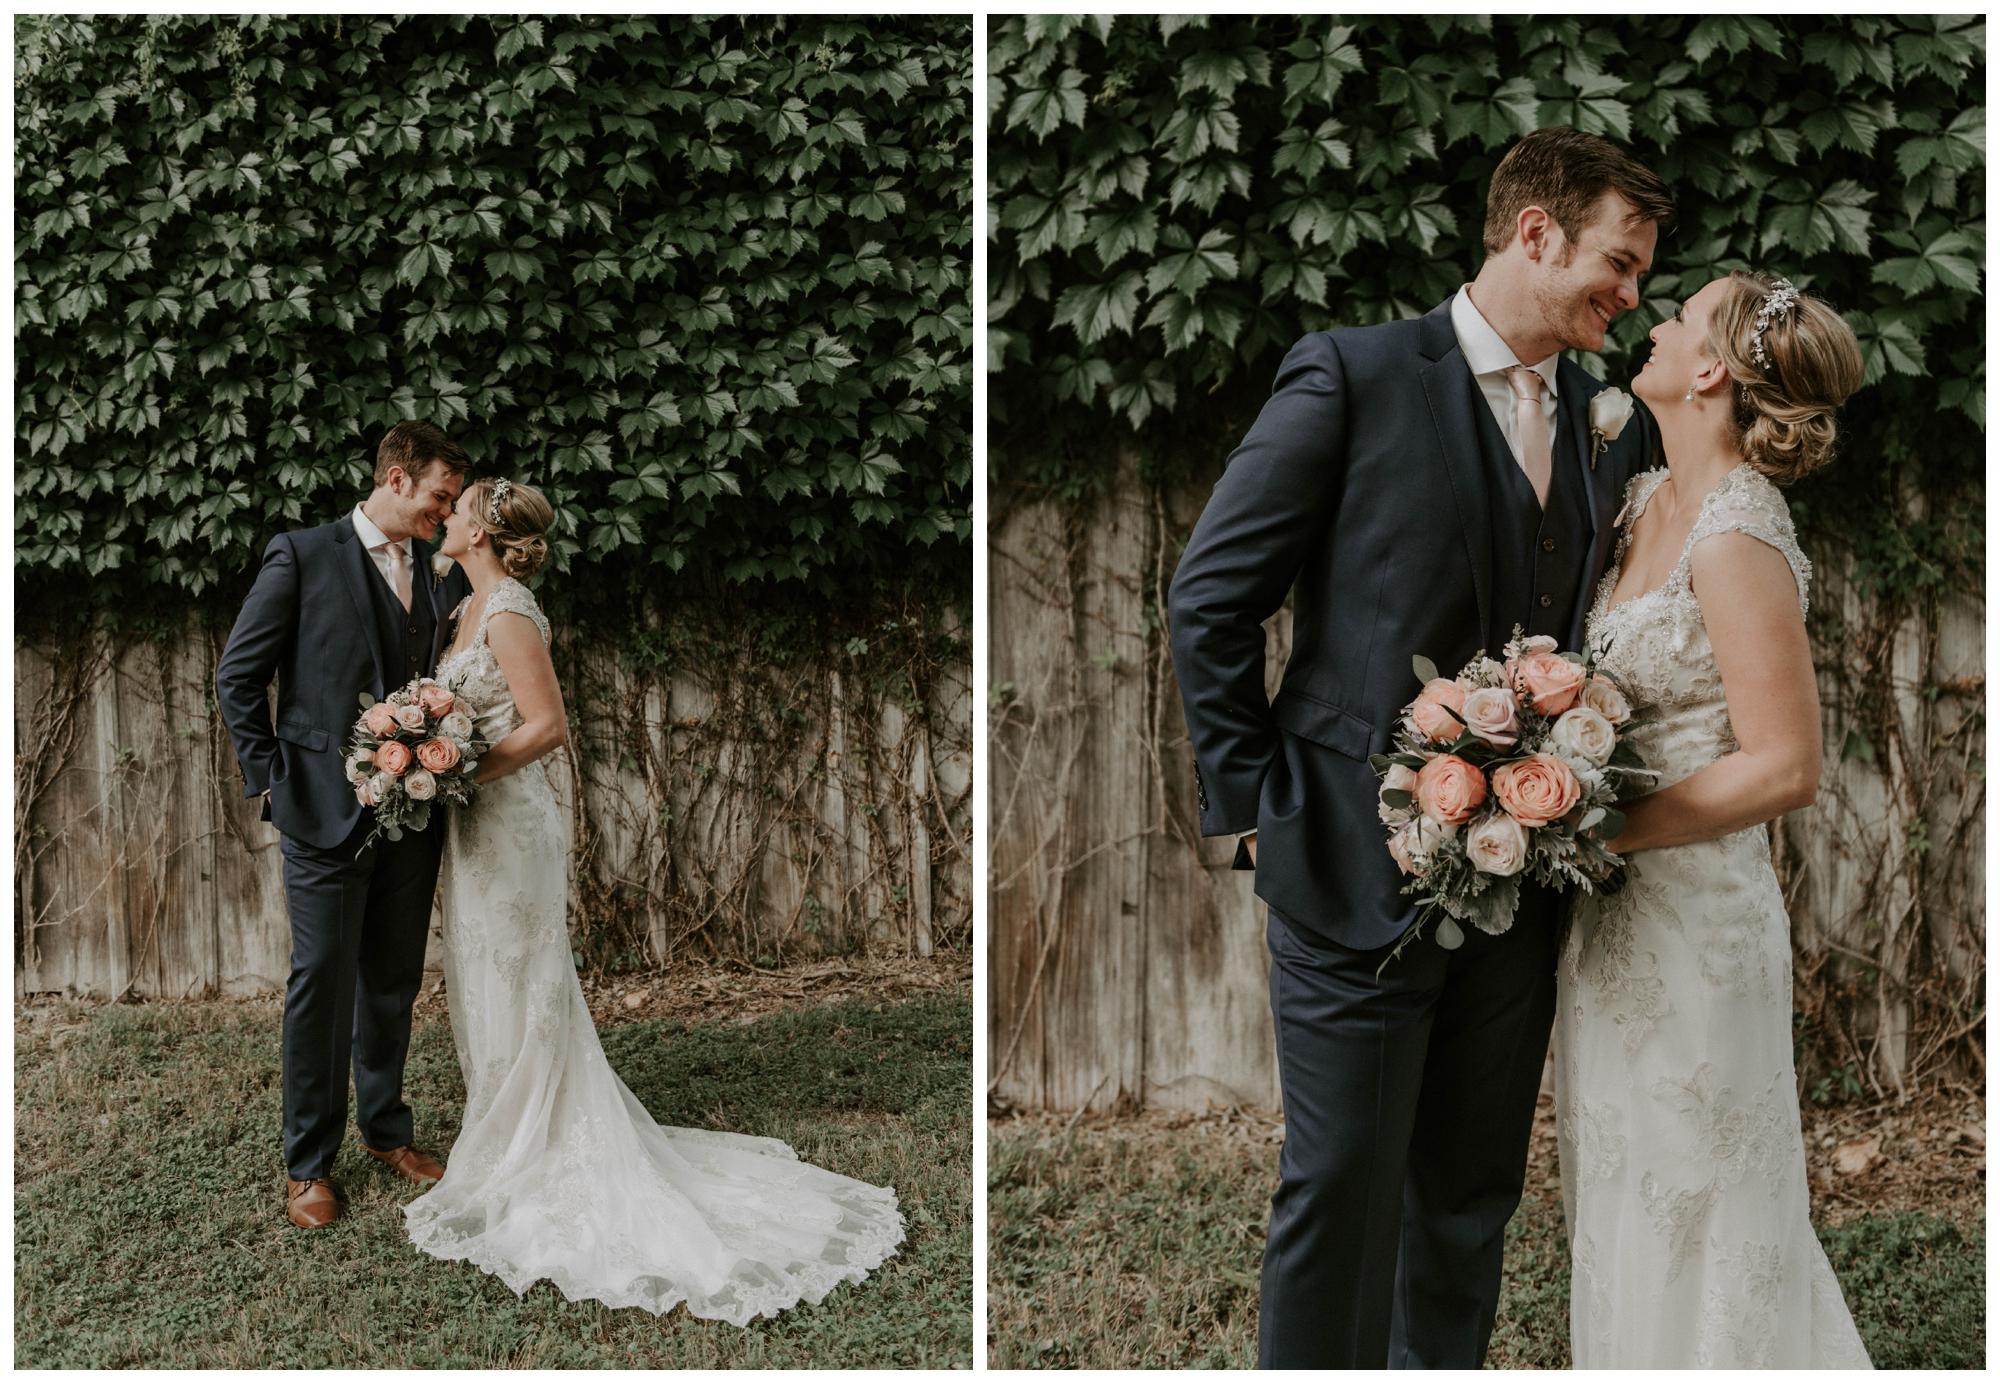 austin-texas-wedding-photography-1778-photographie_0088.jpg